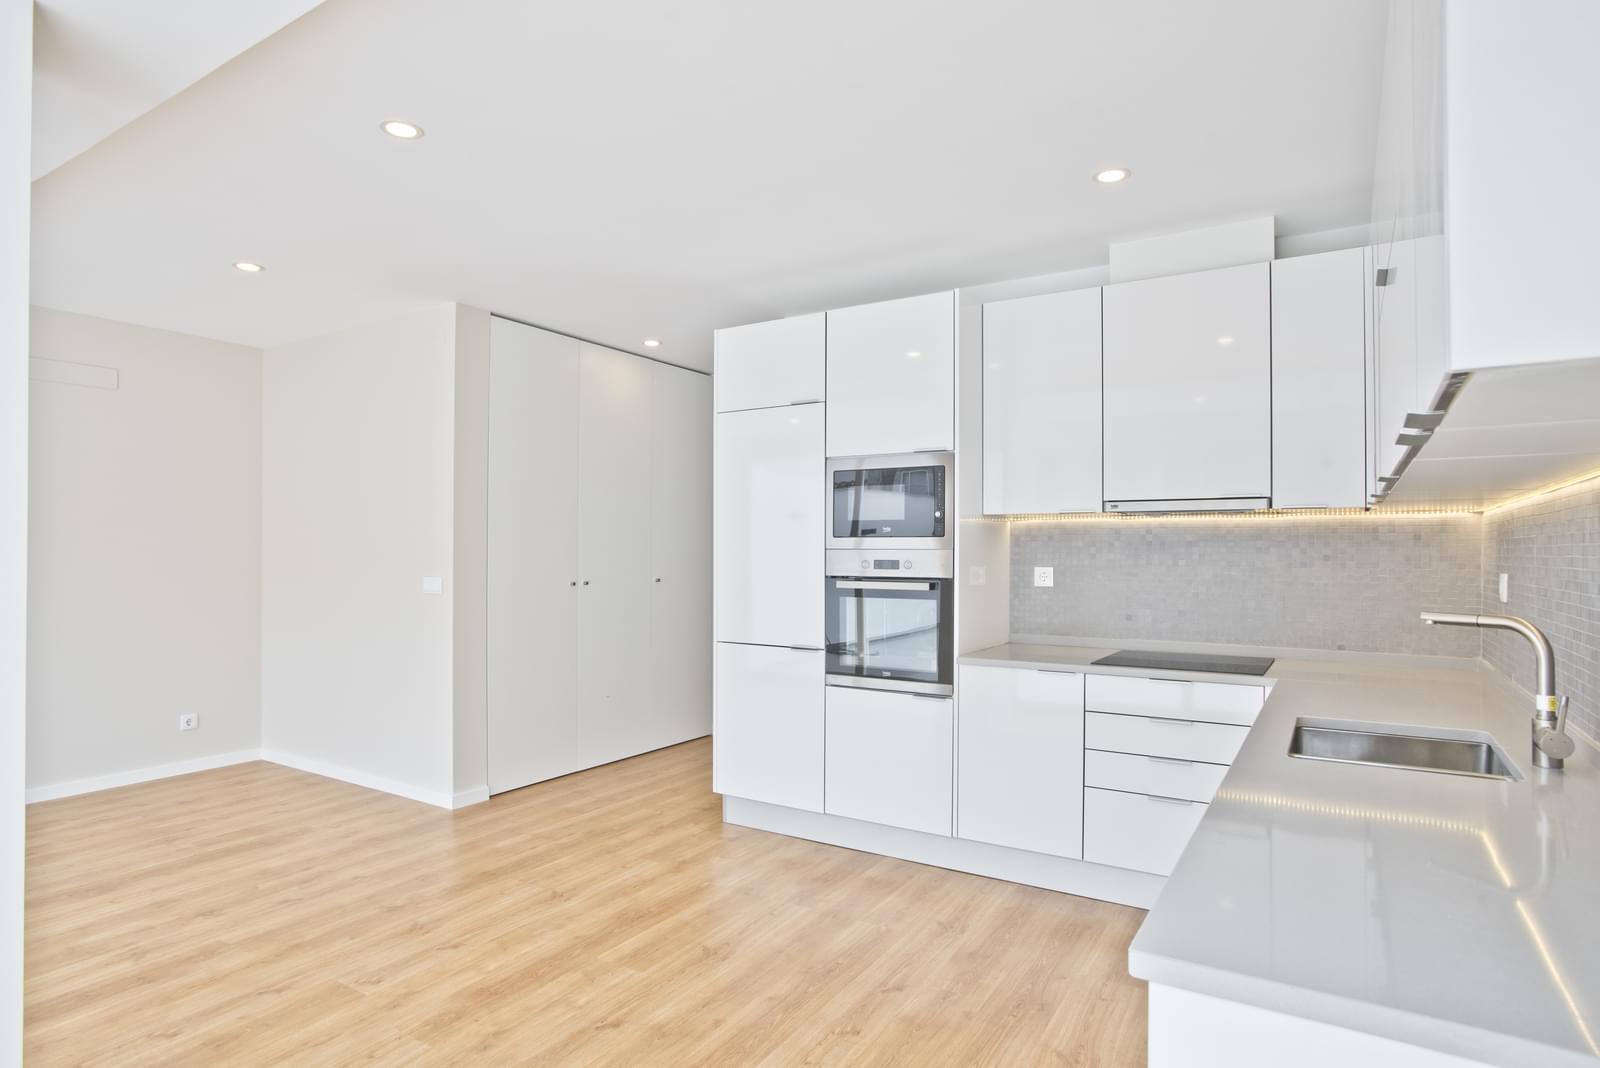 pf16986-apartamento-t2-cascais-a685a80a-2b7f-434c-aa31-b33e67cc13a1